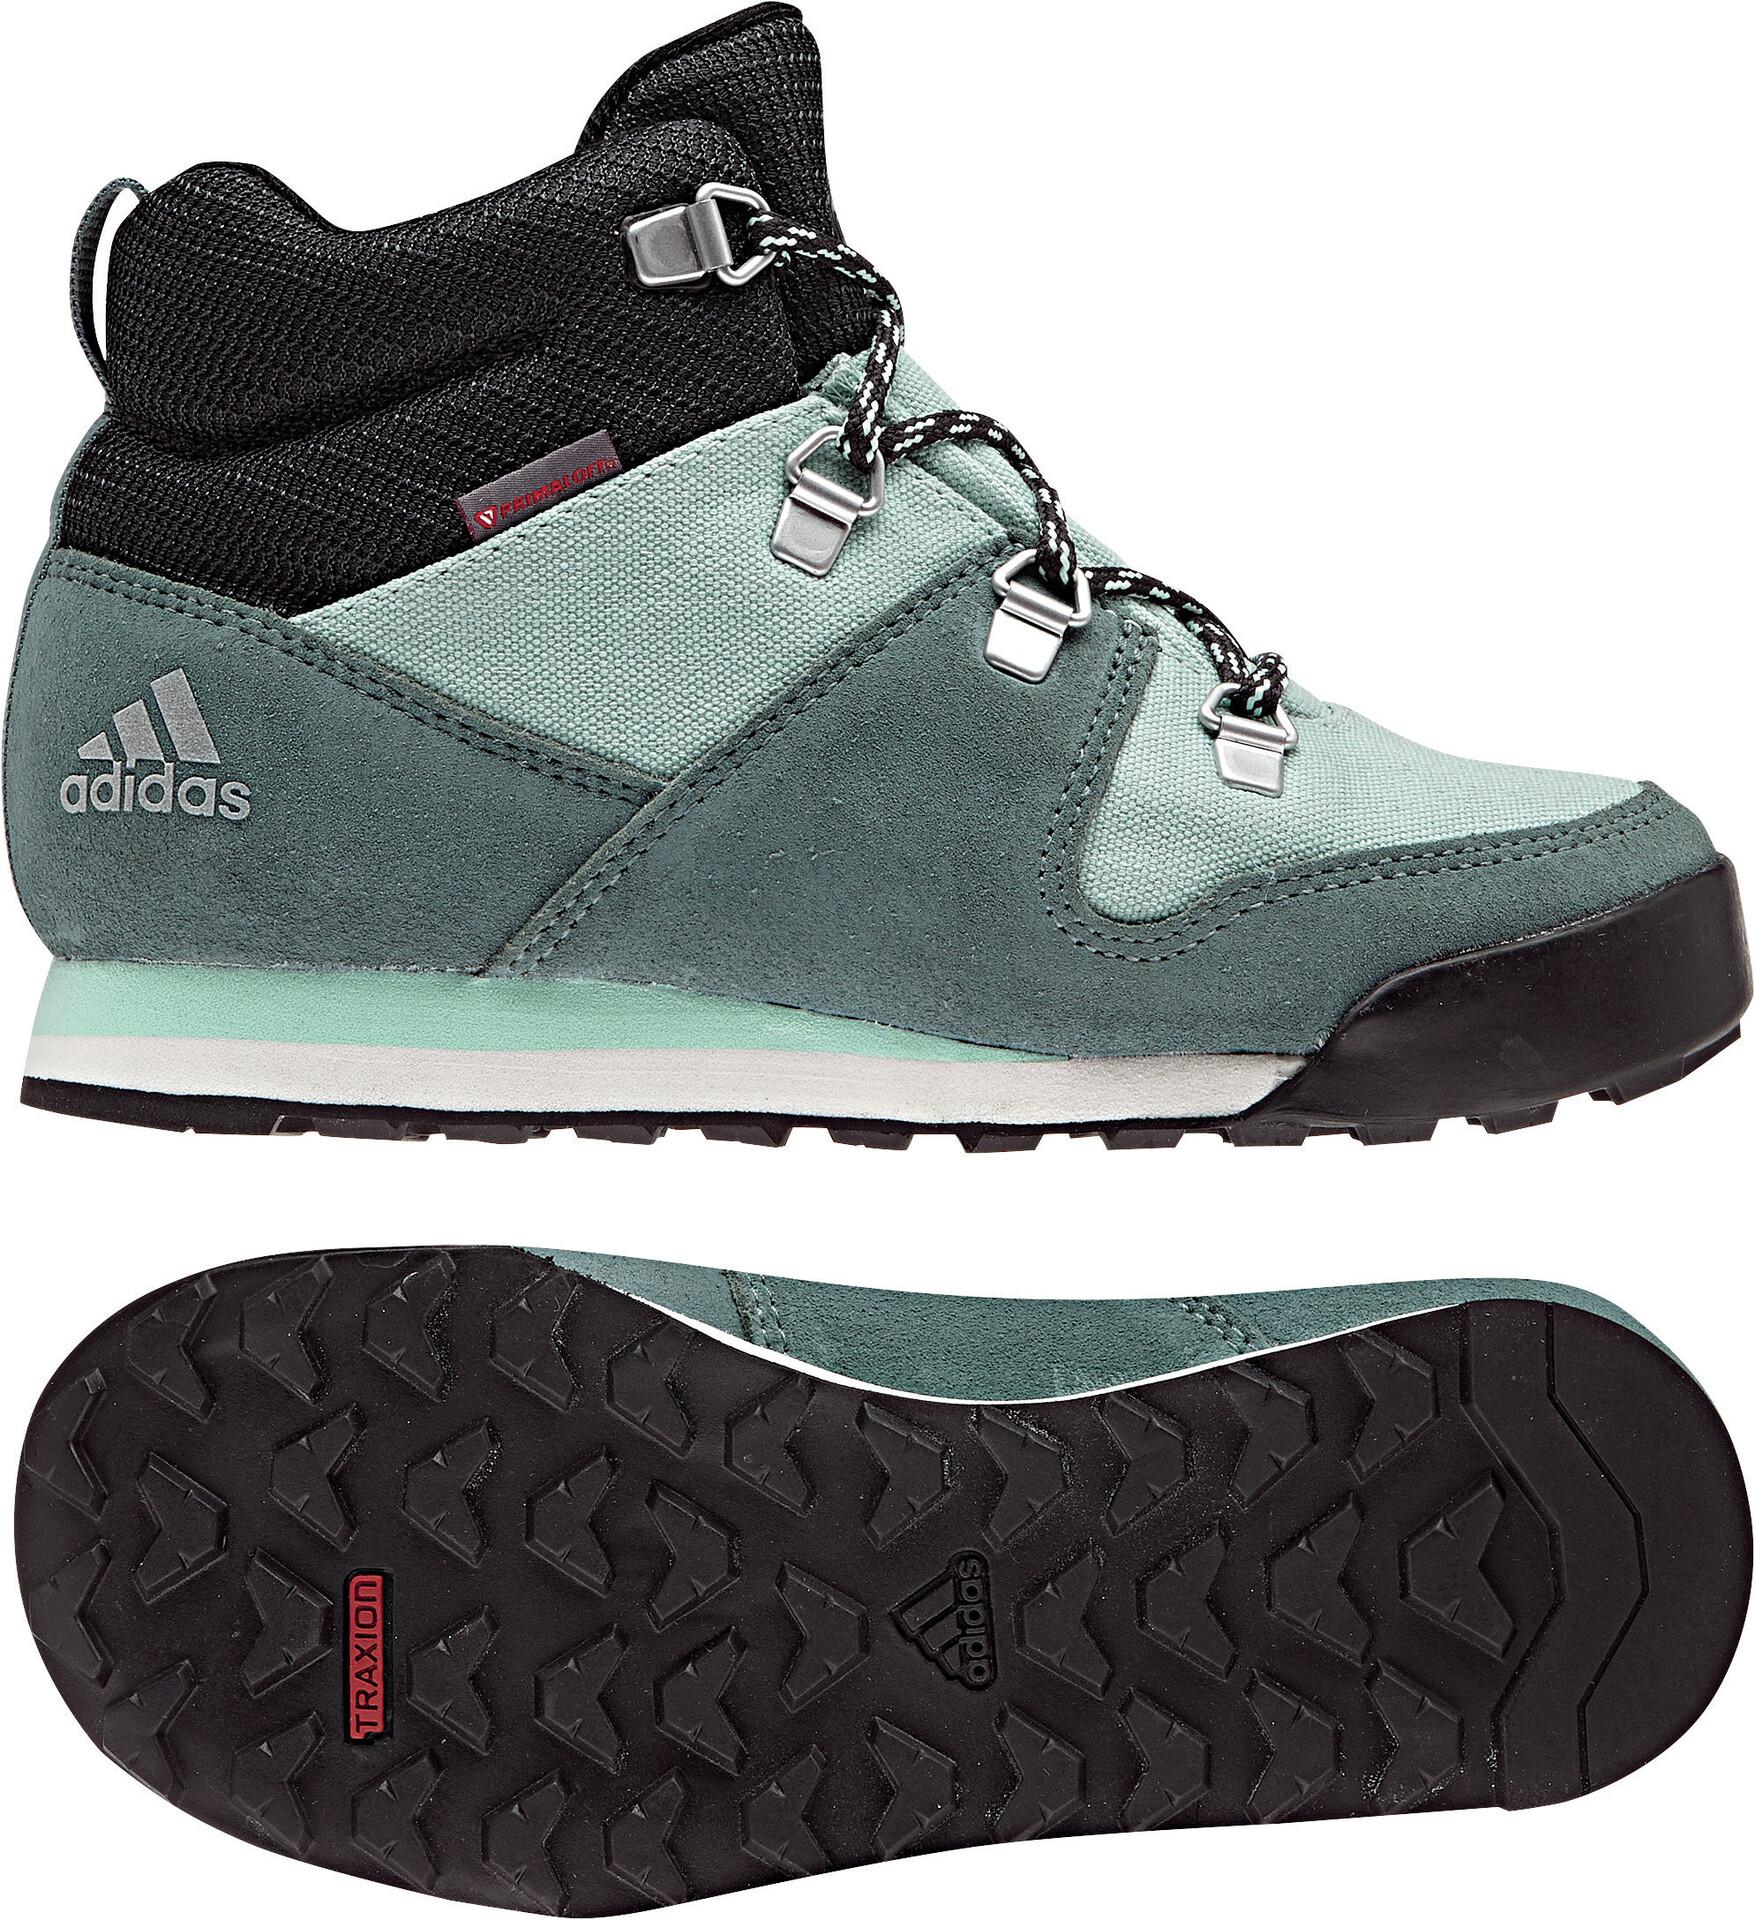 26c0b0194b4f ... sneakers 3ead5 979fc  inexpensive adidas terrex snowpitch sko børn blå  sort 3dcbb e6aad